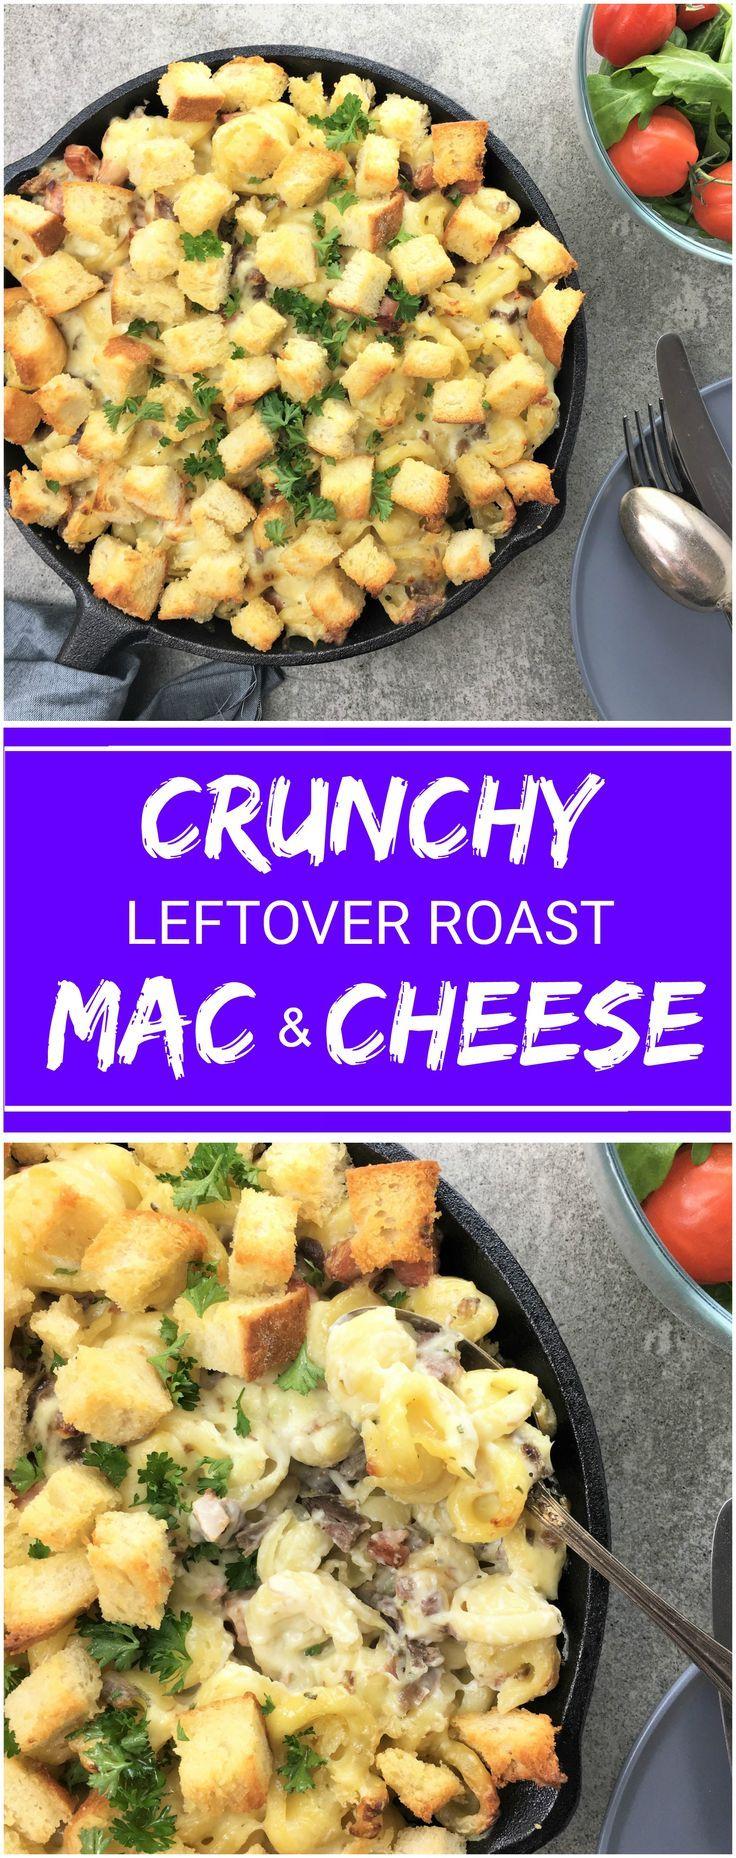 Mac & Cheese using leftover roast lamb | mac n cheese | leftovers | crunchy